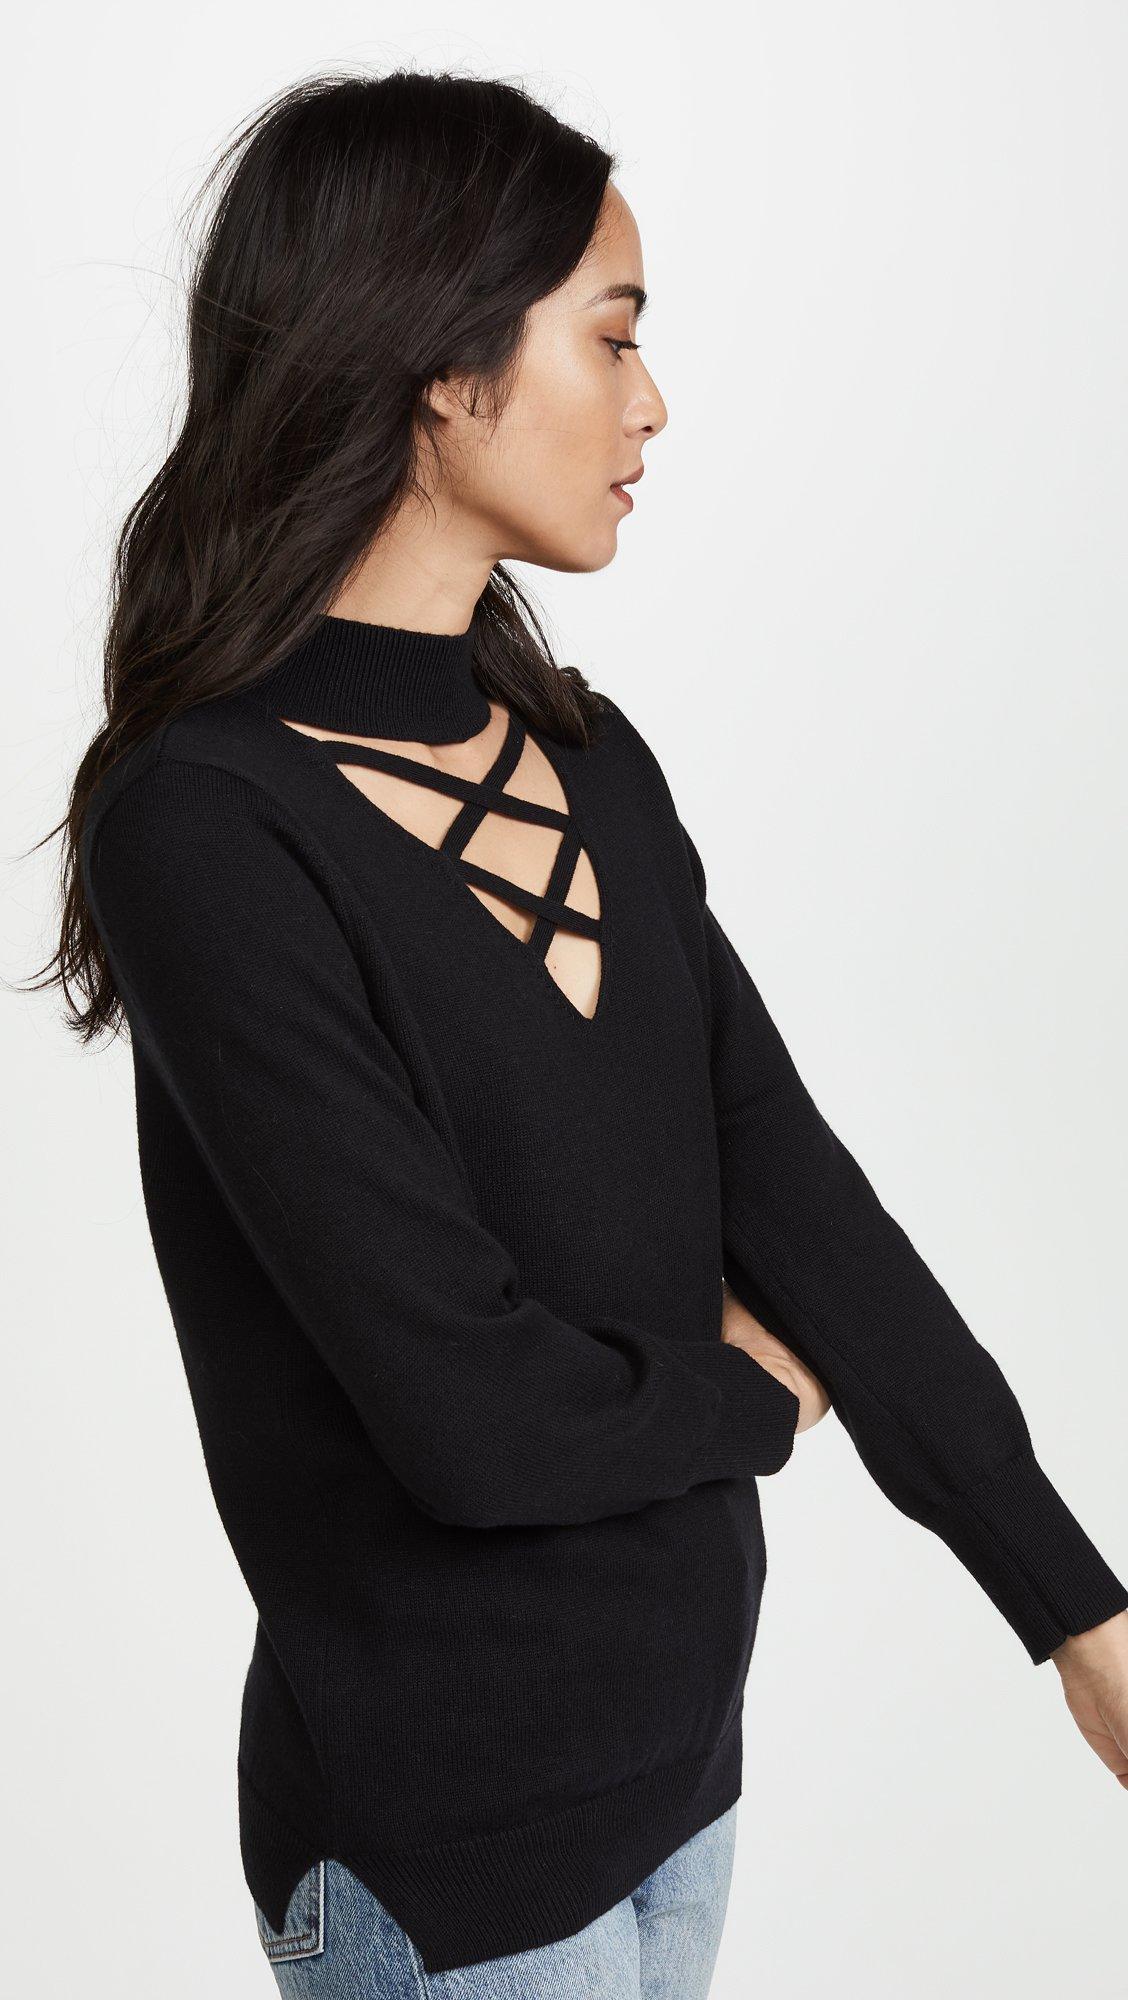 LNA Women's Joey Detached Sweater, Black, Small by LNA (Image #4)